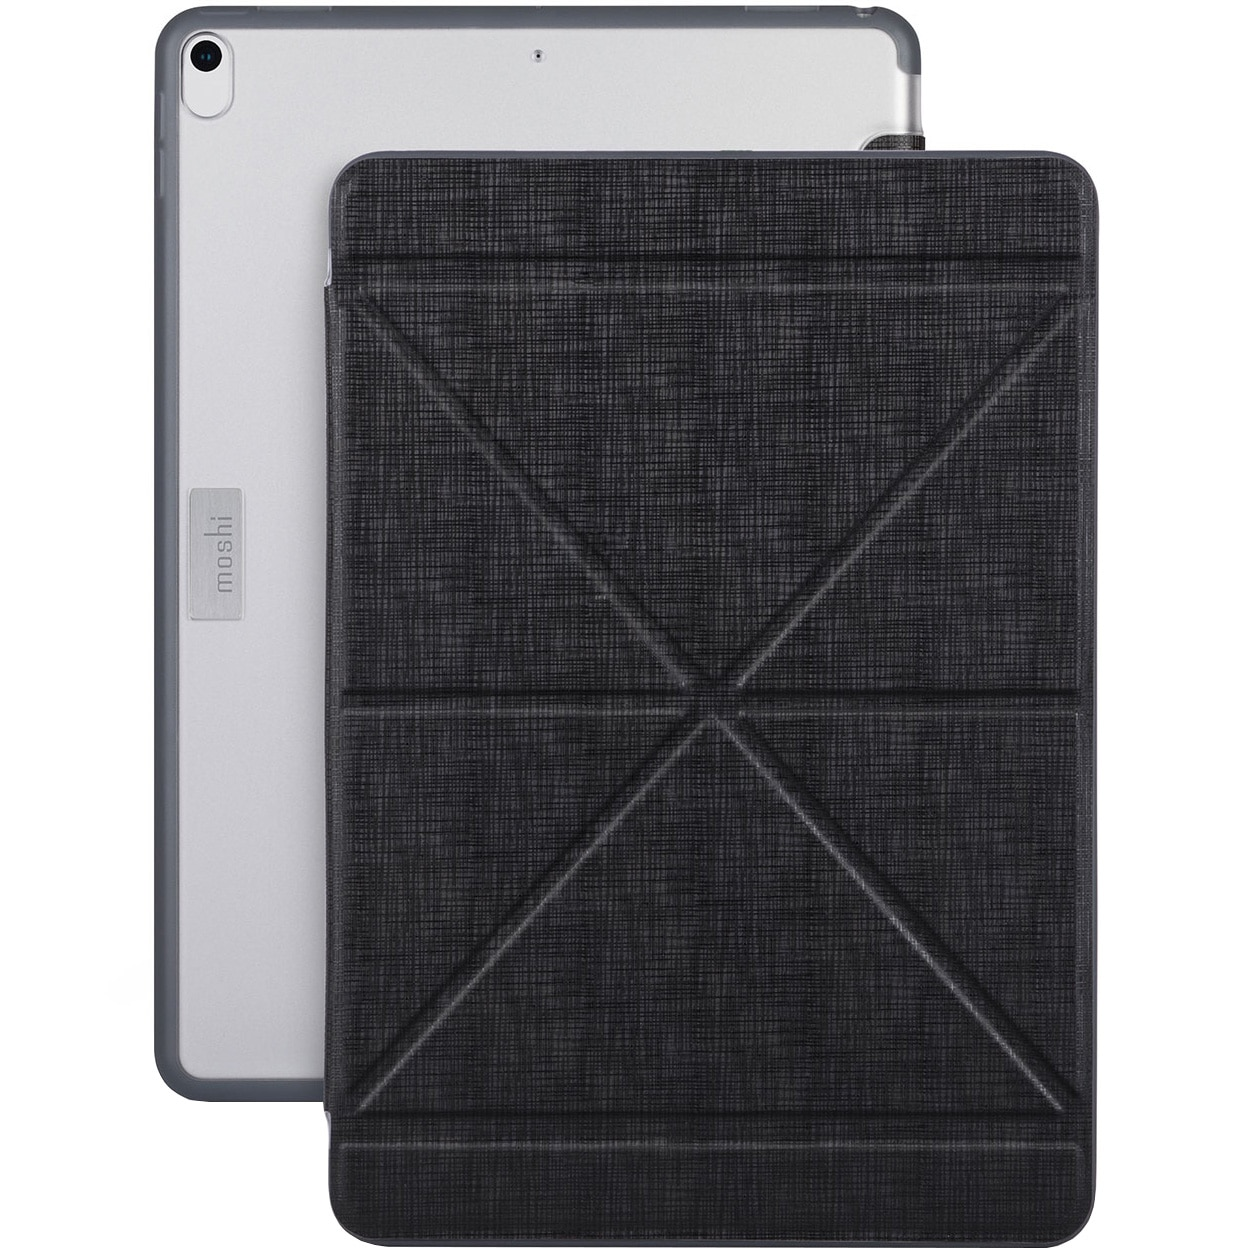 Fotografie Husa de protectie Moshi VersaCover pentru iPad Pro 10.5/Air, Black